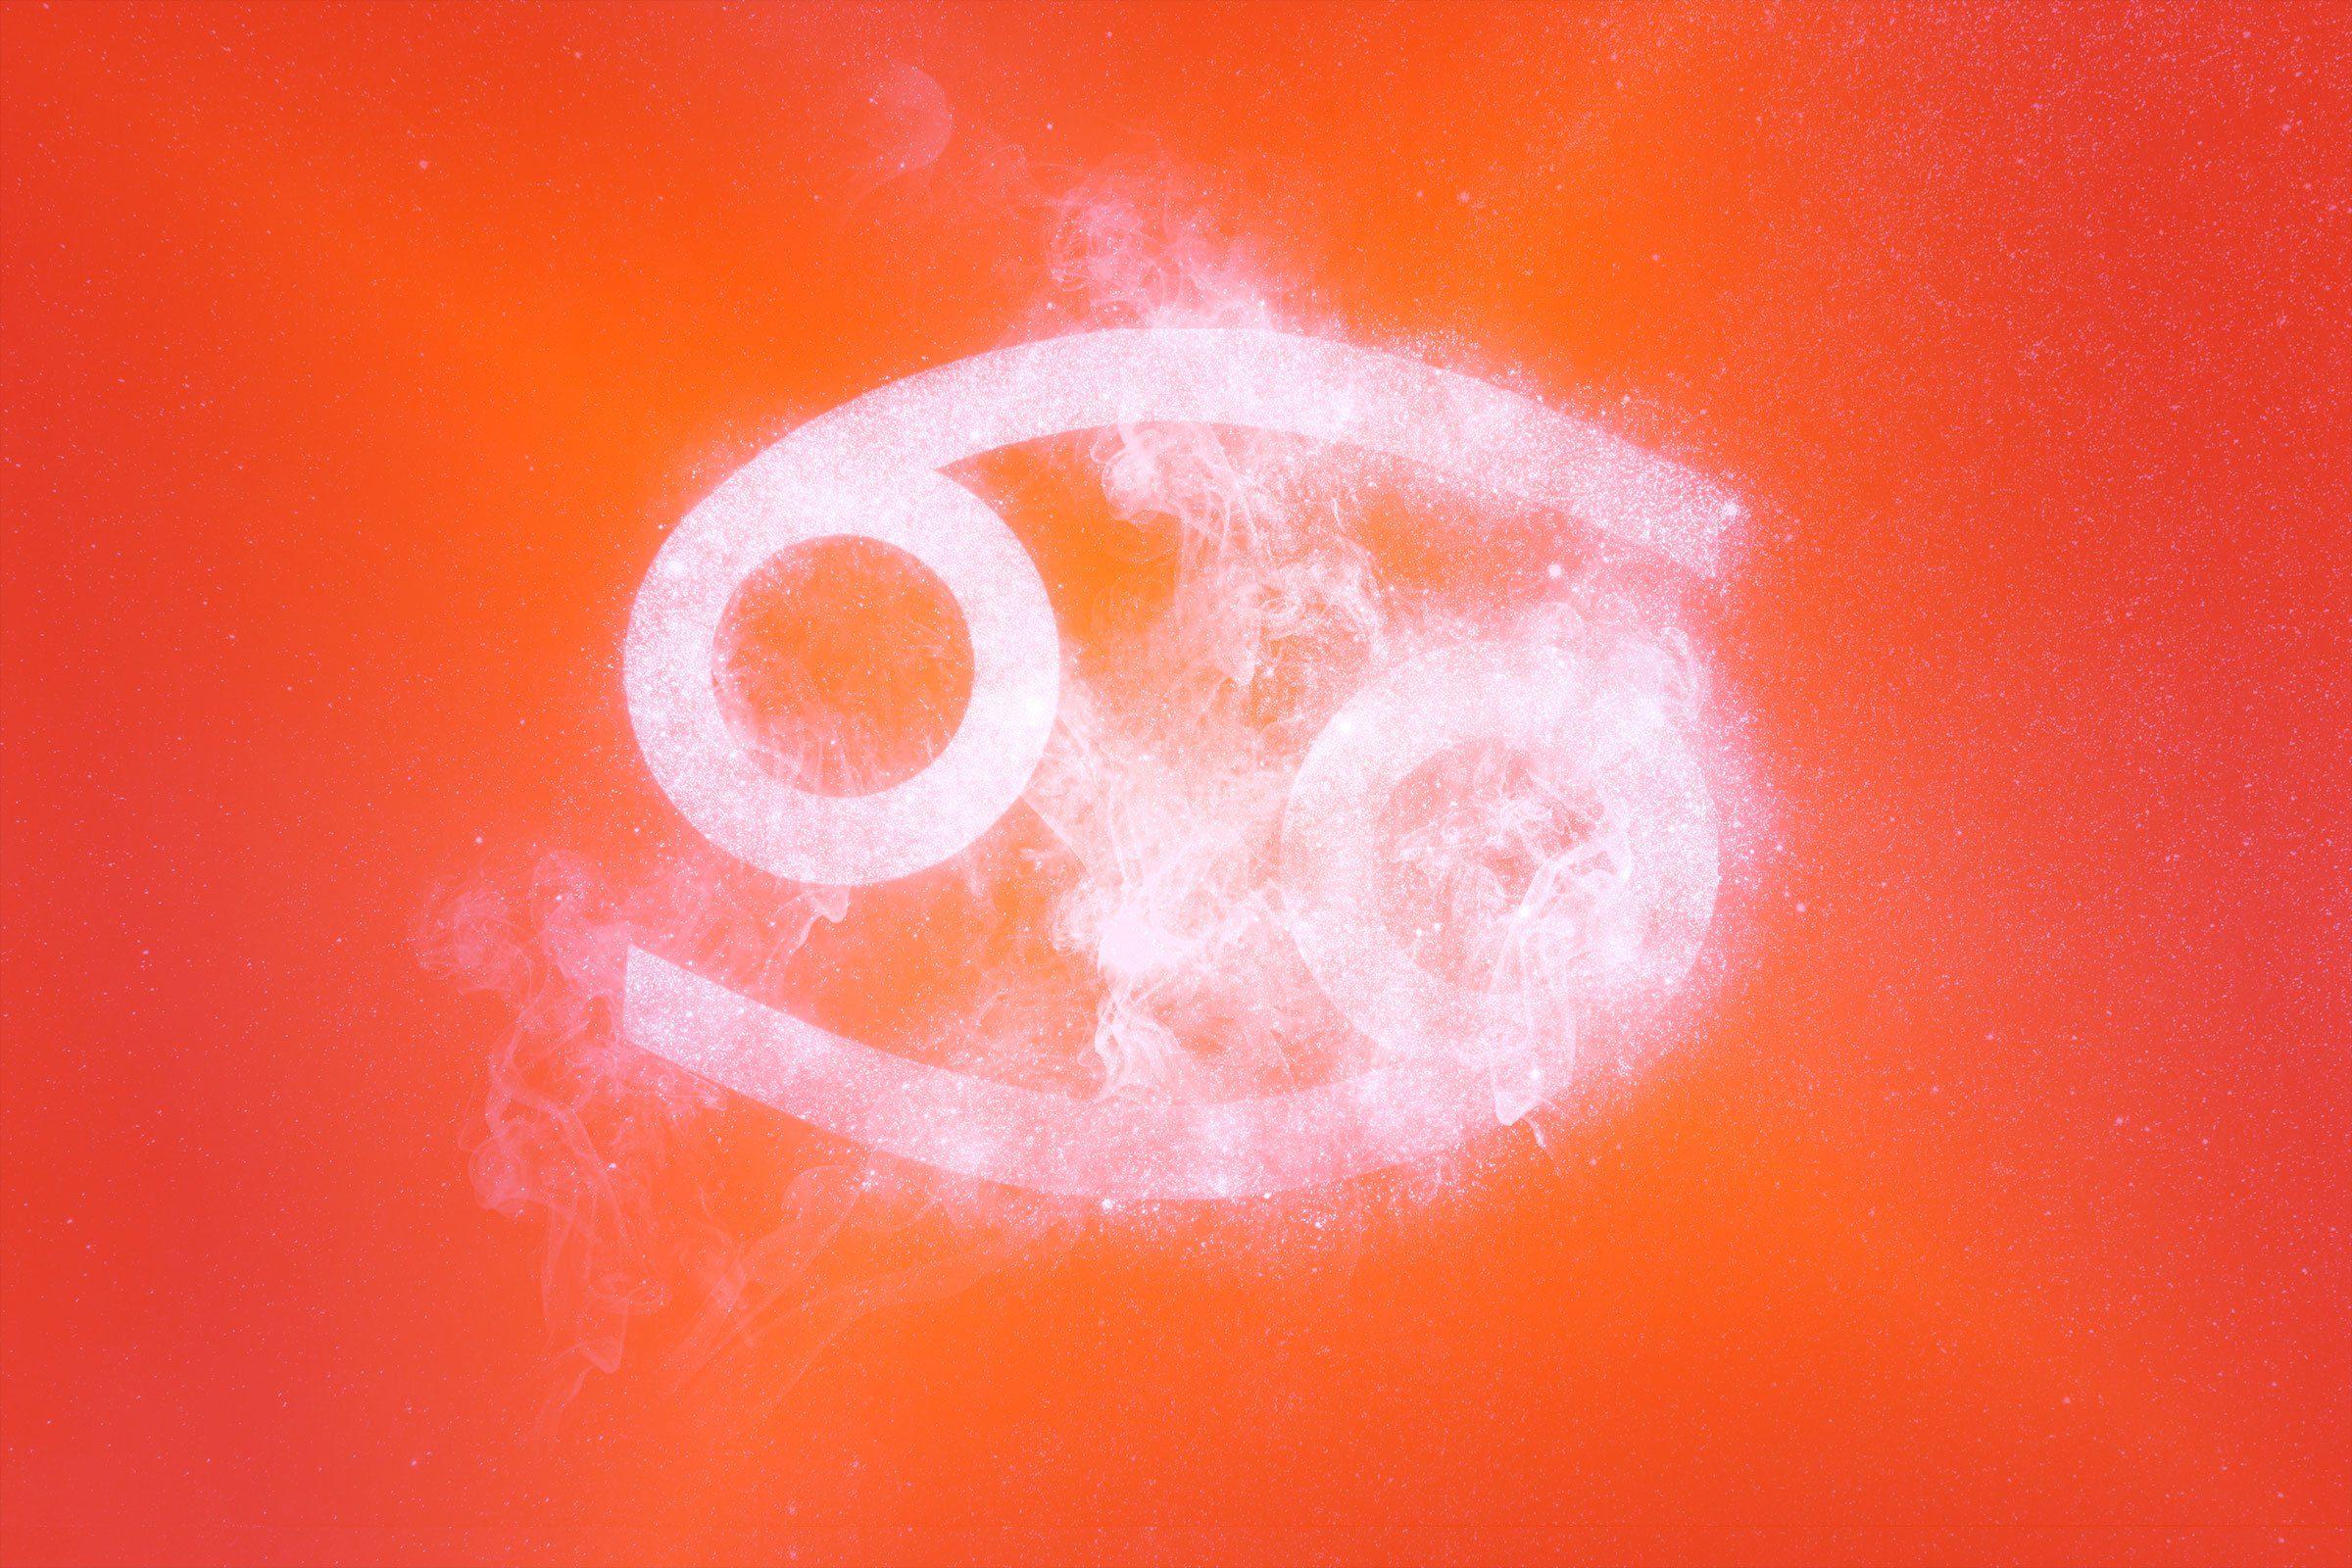 cancer symbol with red-orange gradient overlay